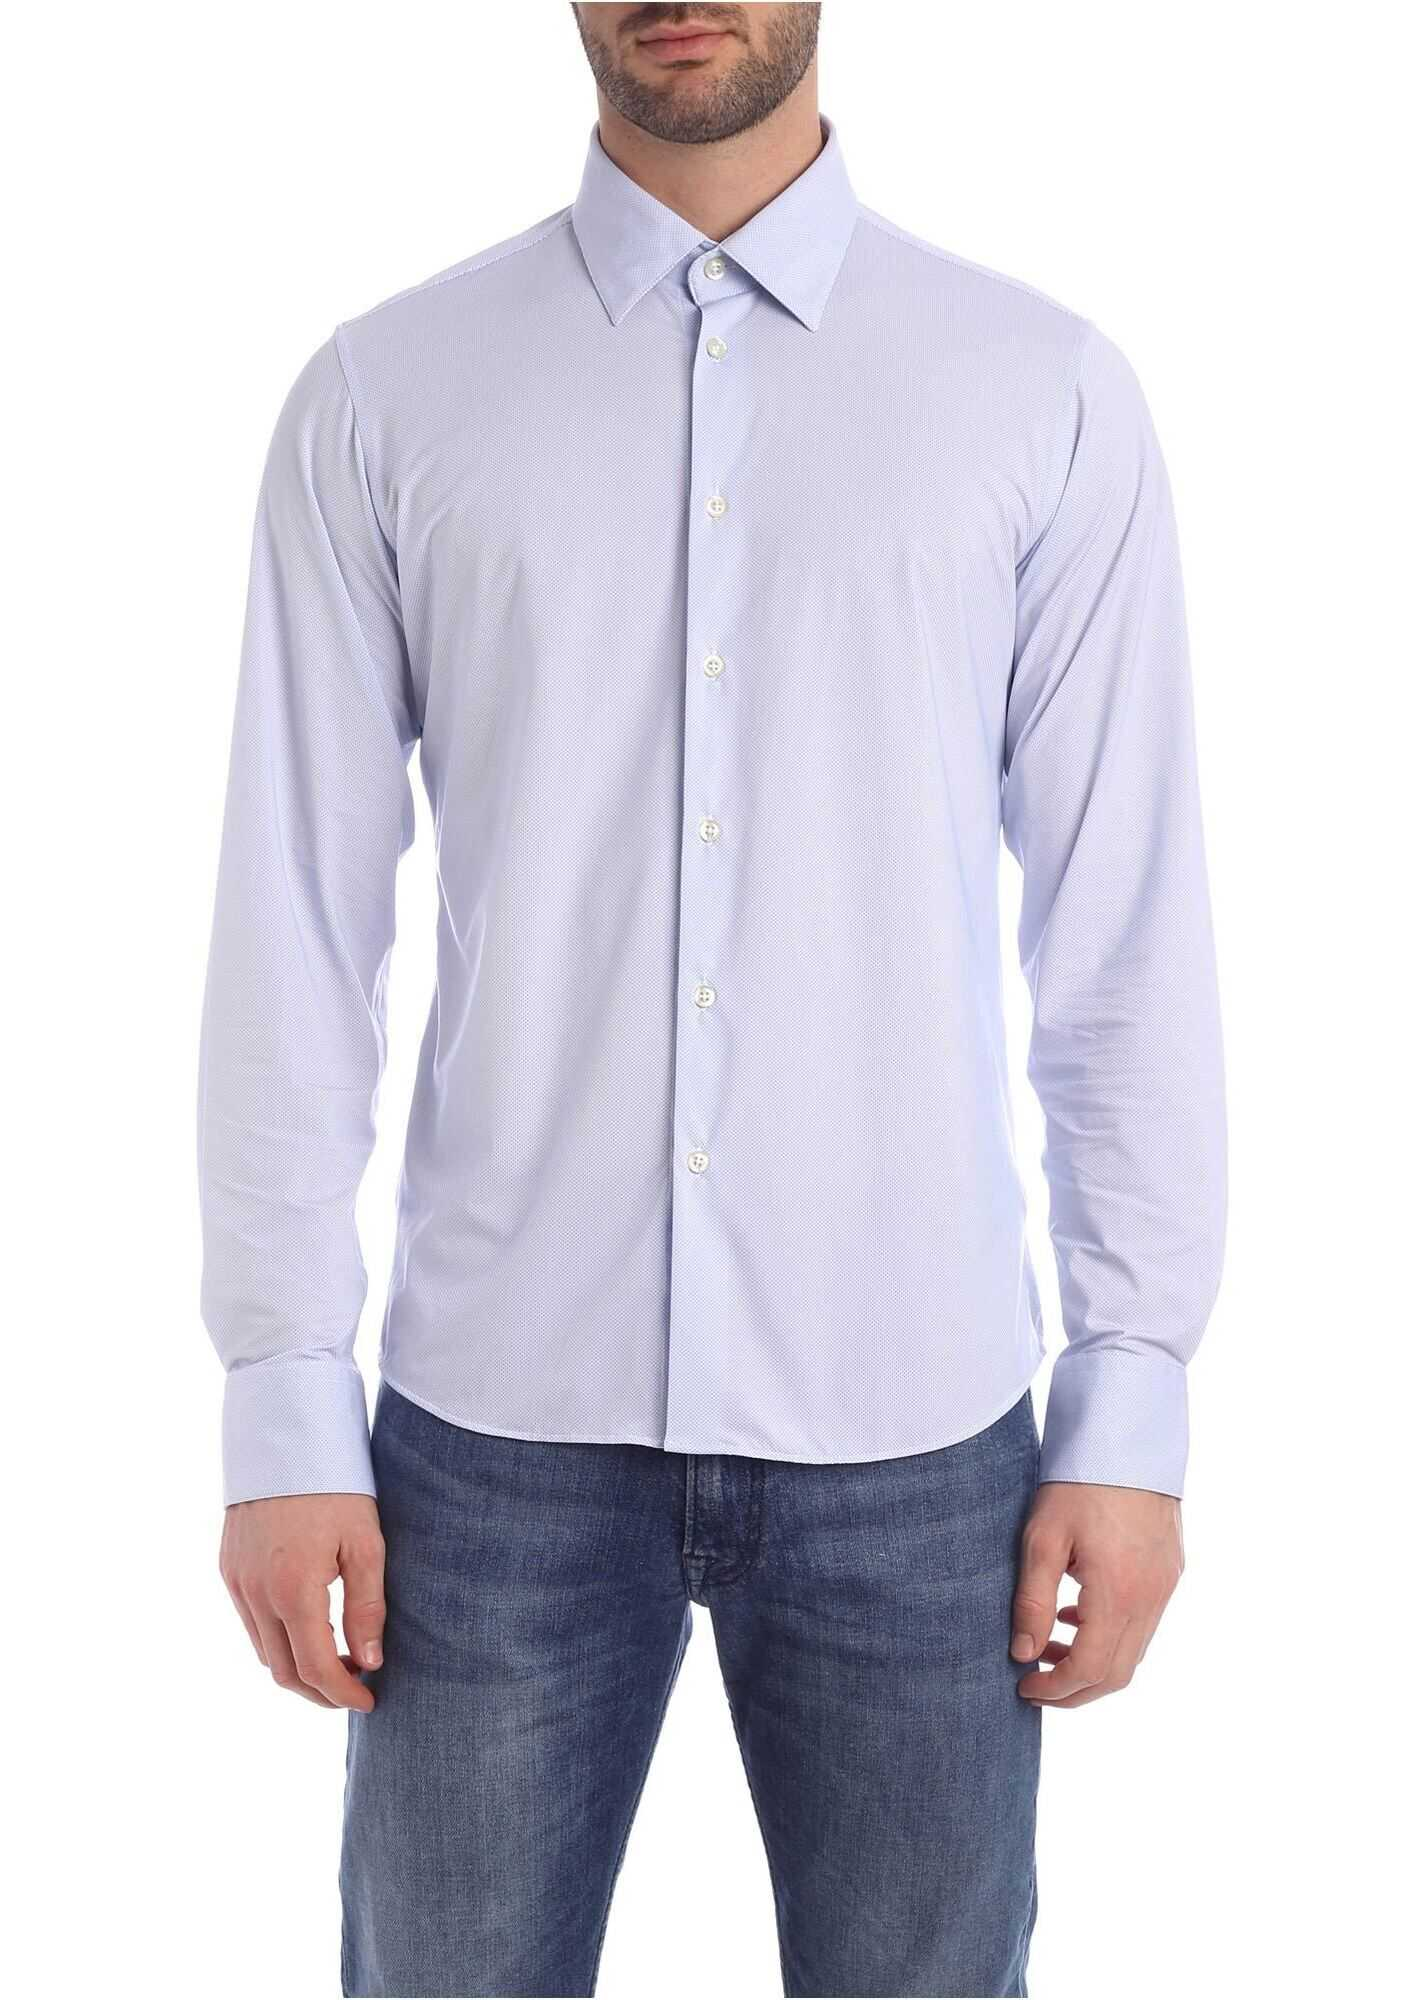 RRD Roberto Ricci Designs Oxford Jacquard Shirt In Light Blue Light Blue imagine